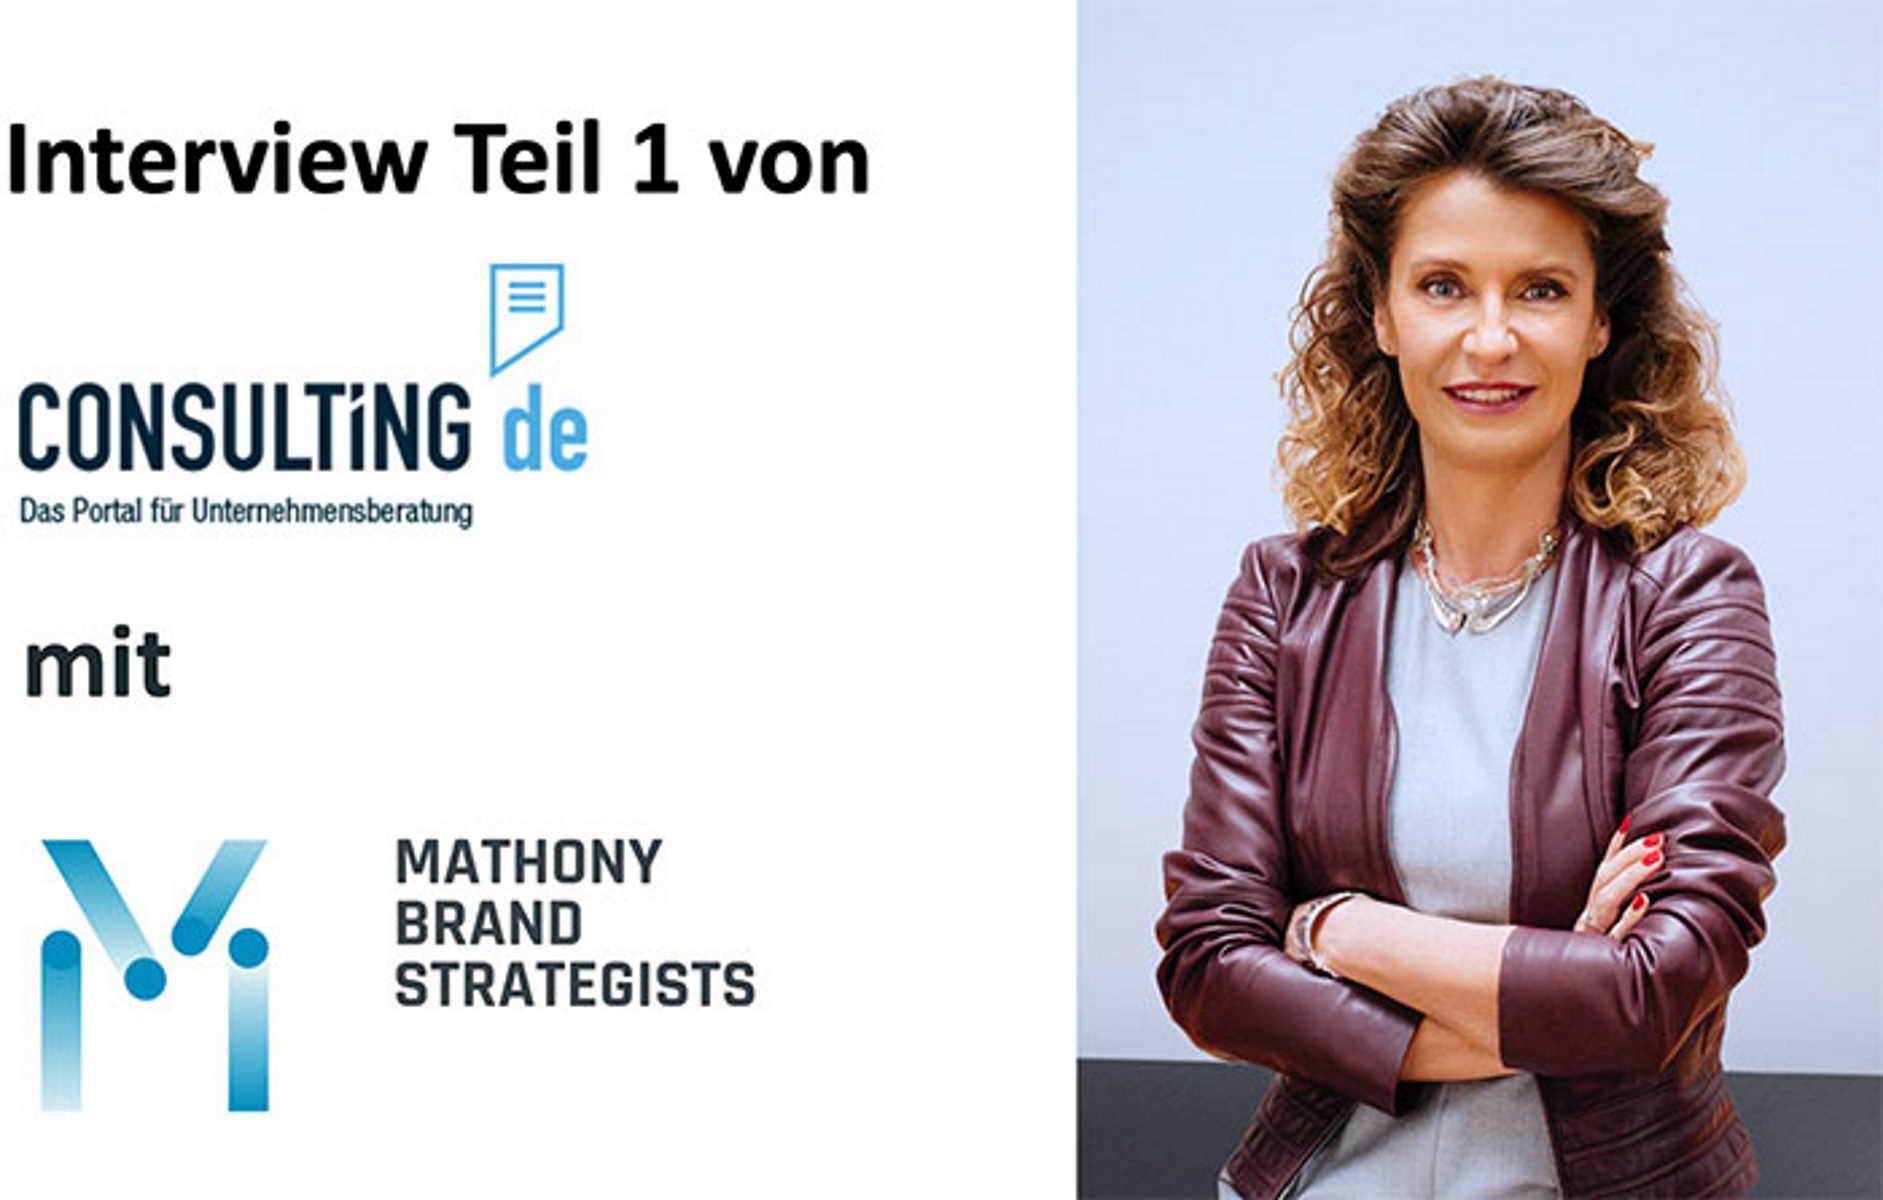 Susanne Mathony Brand Strategists